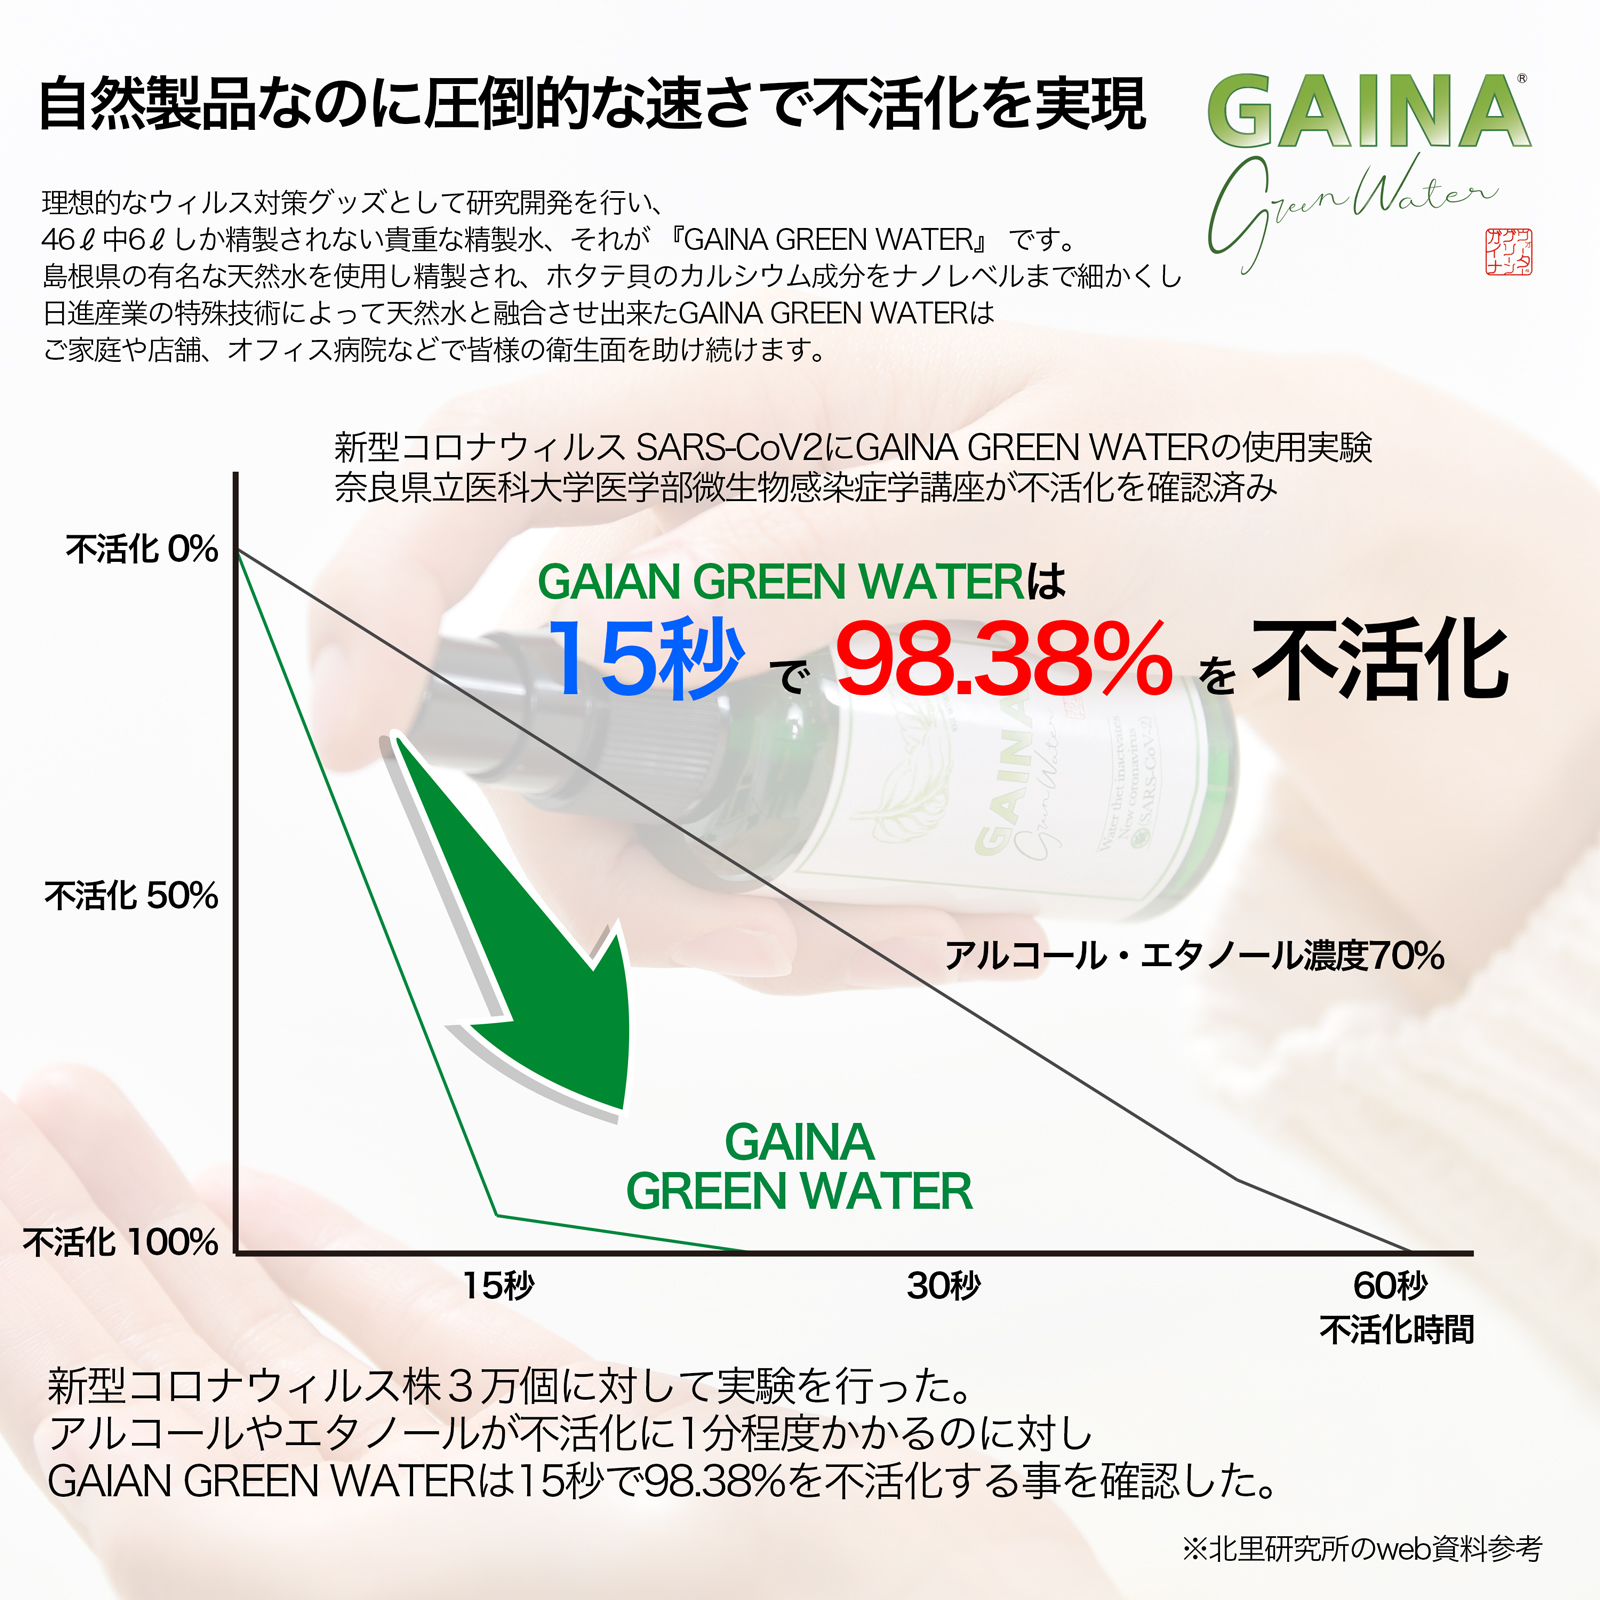 GAINAグリーンウォーター10Lタンク (10000ml、コック付き)